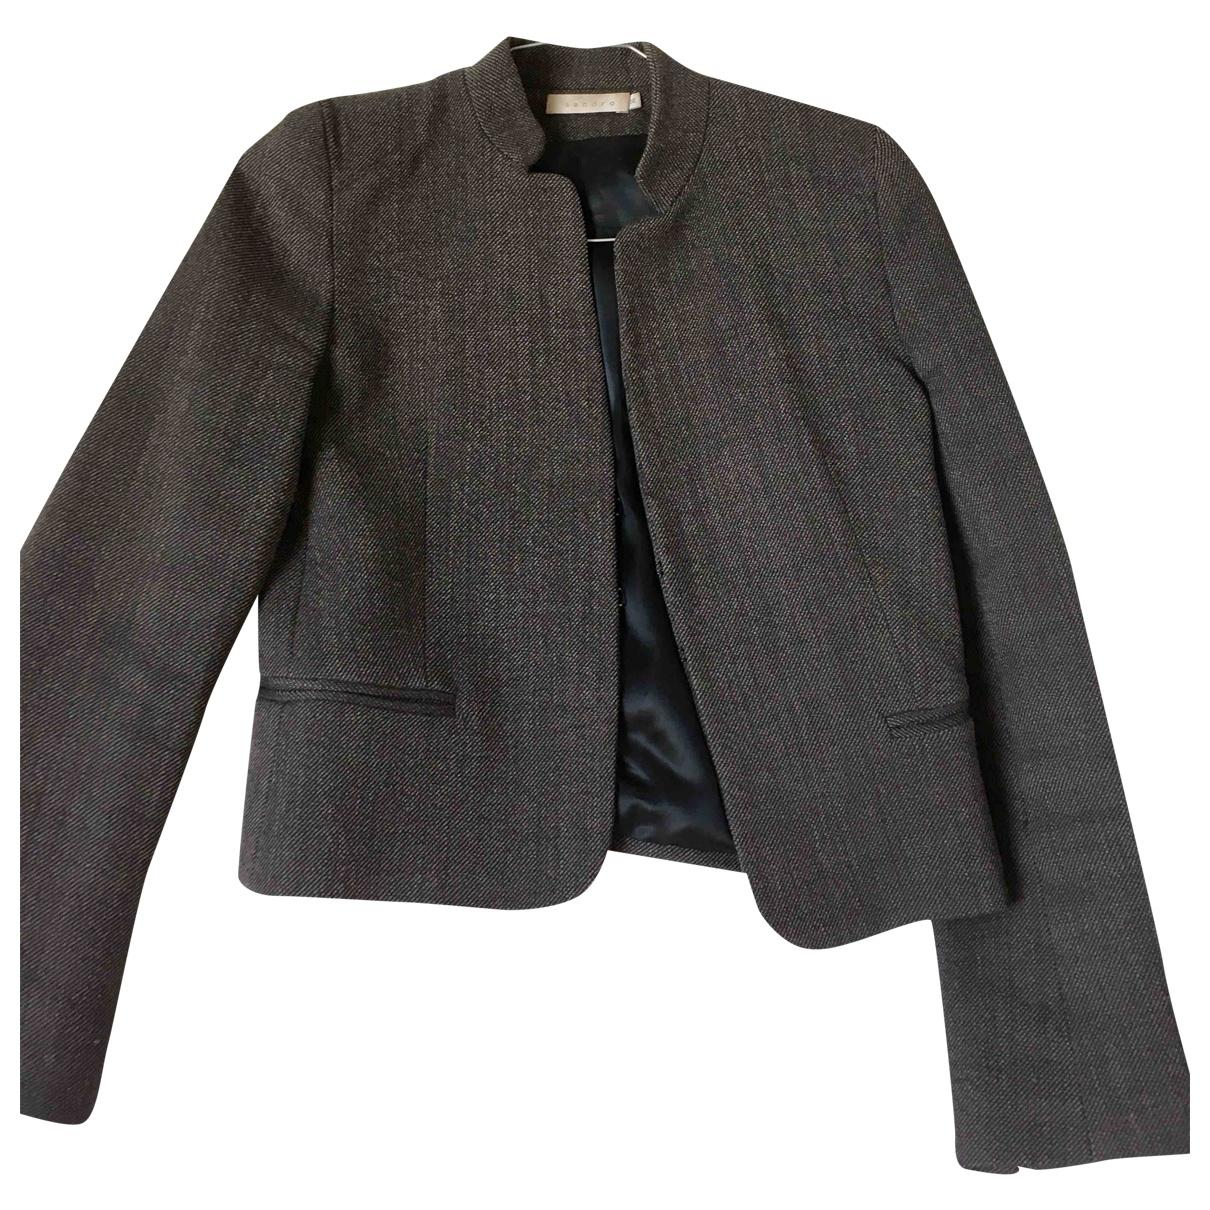 Sandro \N Grey Wool jacket for Women 36 FR